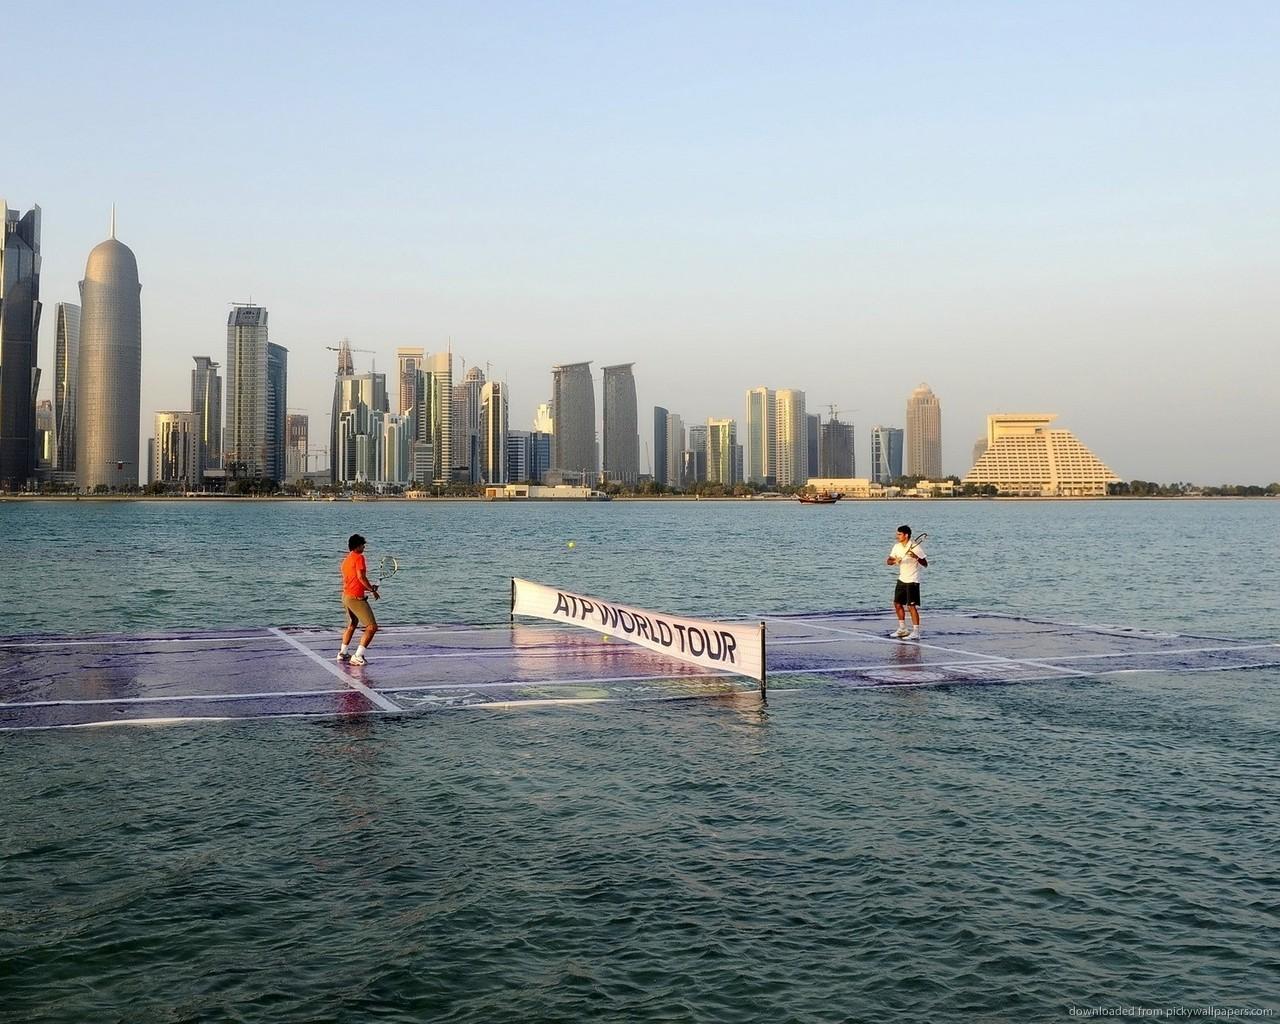 tennis-court-in-the-water-qatar